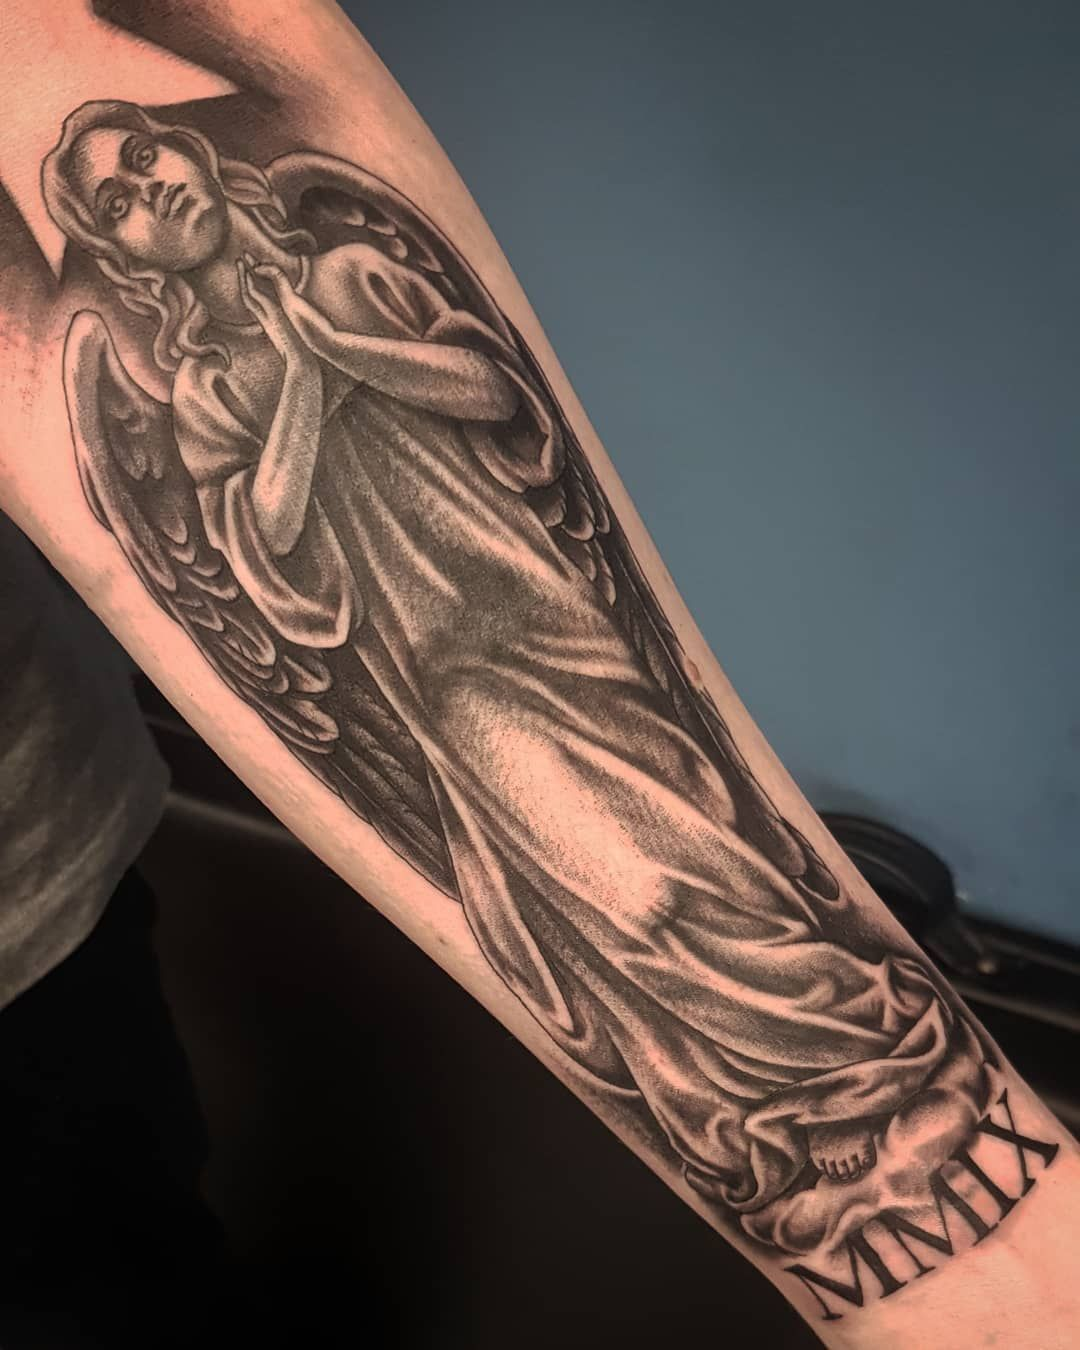 Guardian Angels Tattoos Tattoos For Women Tattoos For Guys Tattoos